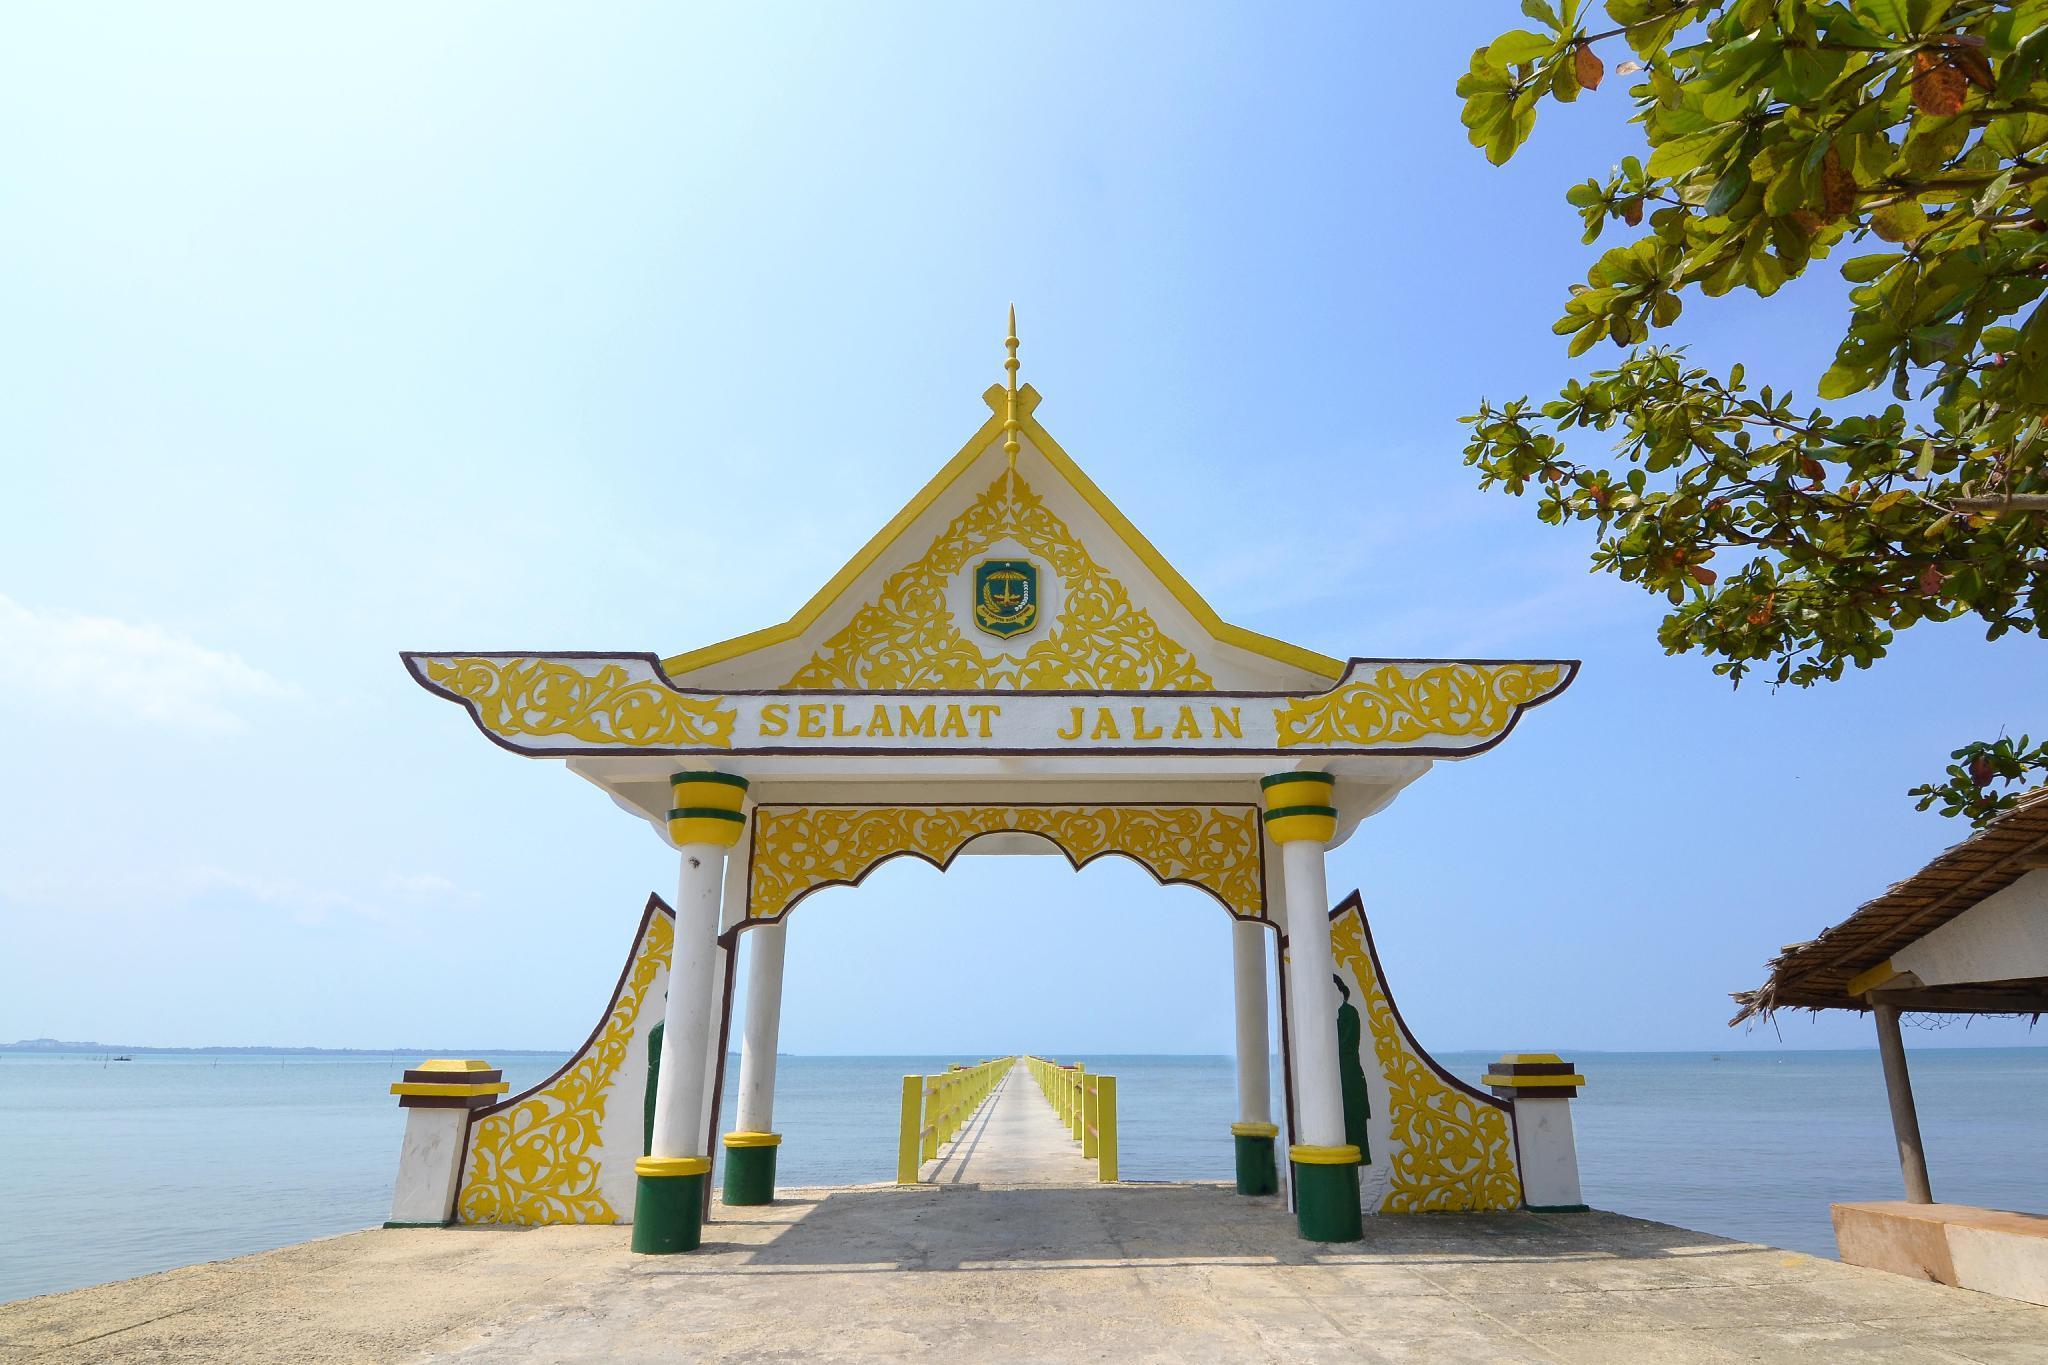 Rumah Raja Homestay Syariah, Tanjung Pinang